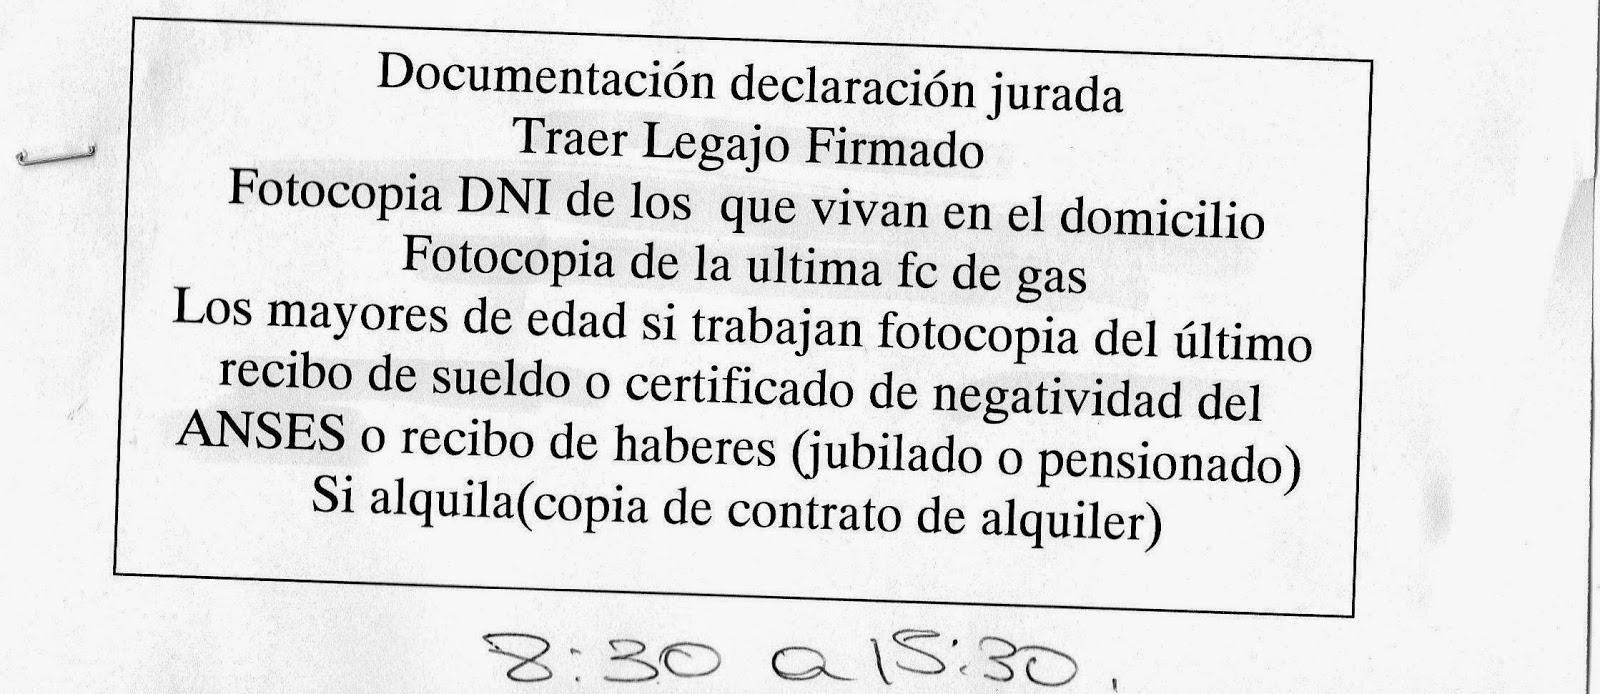 Noticias Hausler: ARGENTINA - METROGAS - TRAMITES DIFÍCILES ...